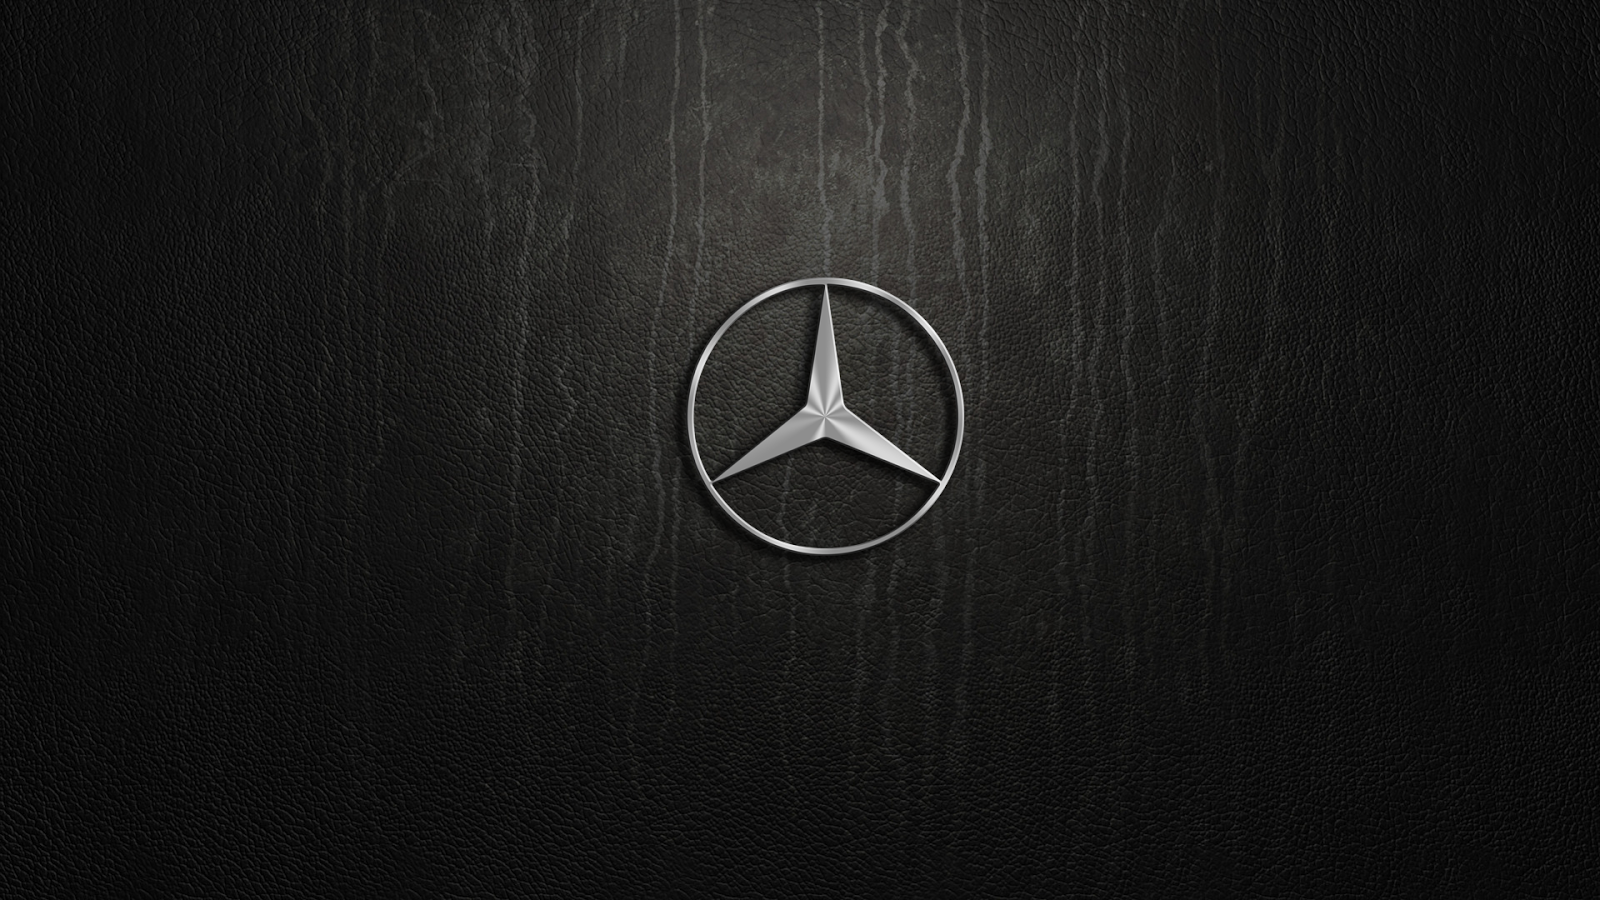 Mercedes Benz Logos In Black Background Mercedes Benz Logos